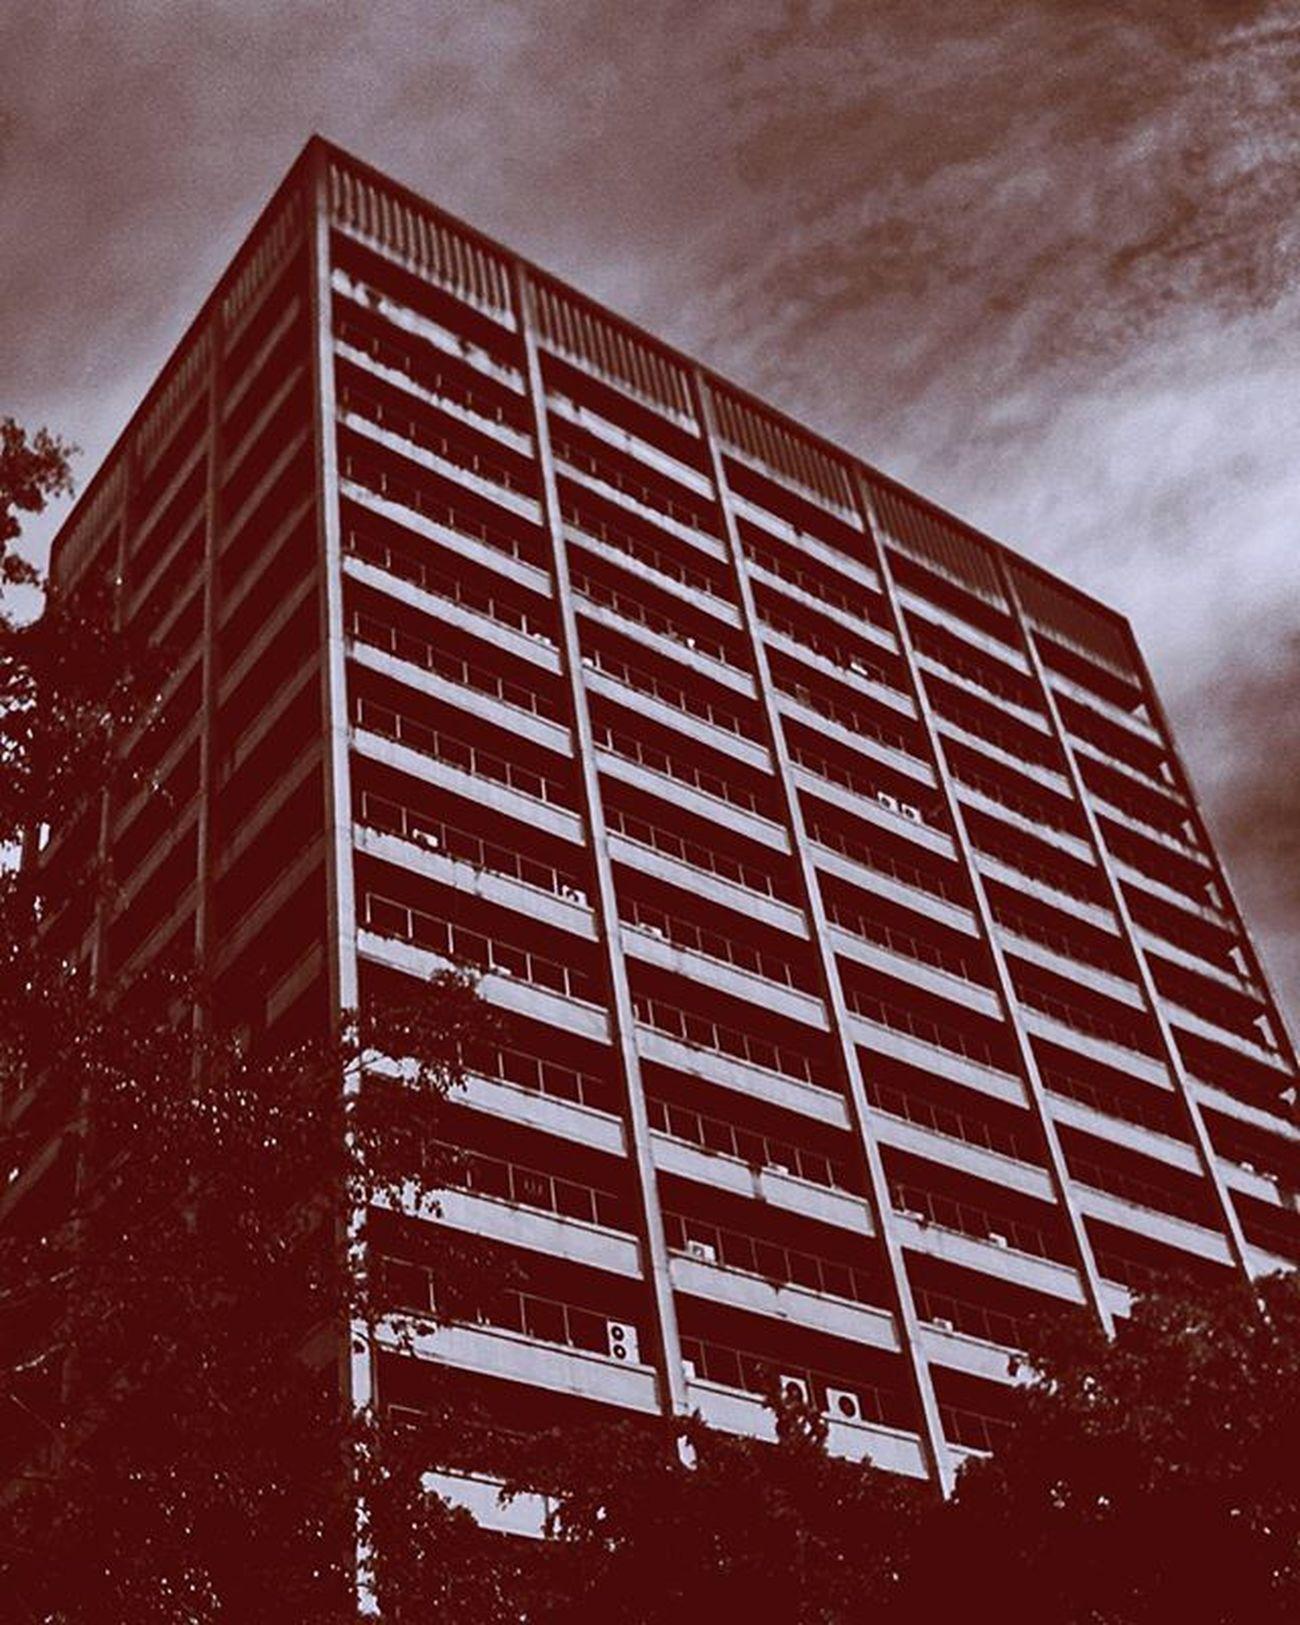 Ahí, donde siempre estoy. CentroPlaza Altamira Family Architecture Juno Red Blue Light Cloud Caracas Work Office Rhythm Photography EvolutionIII Huawei